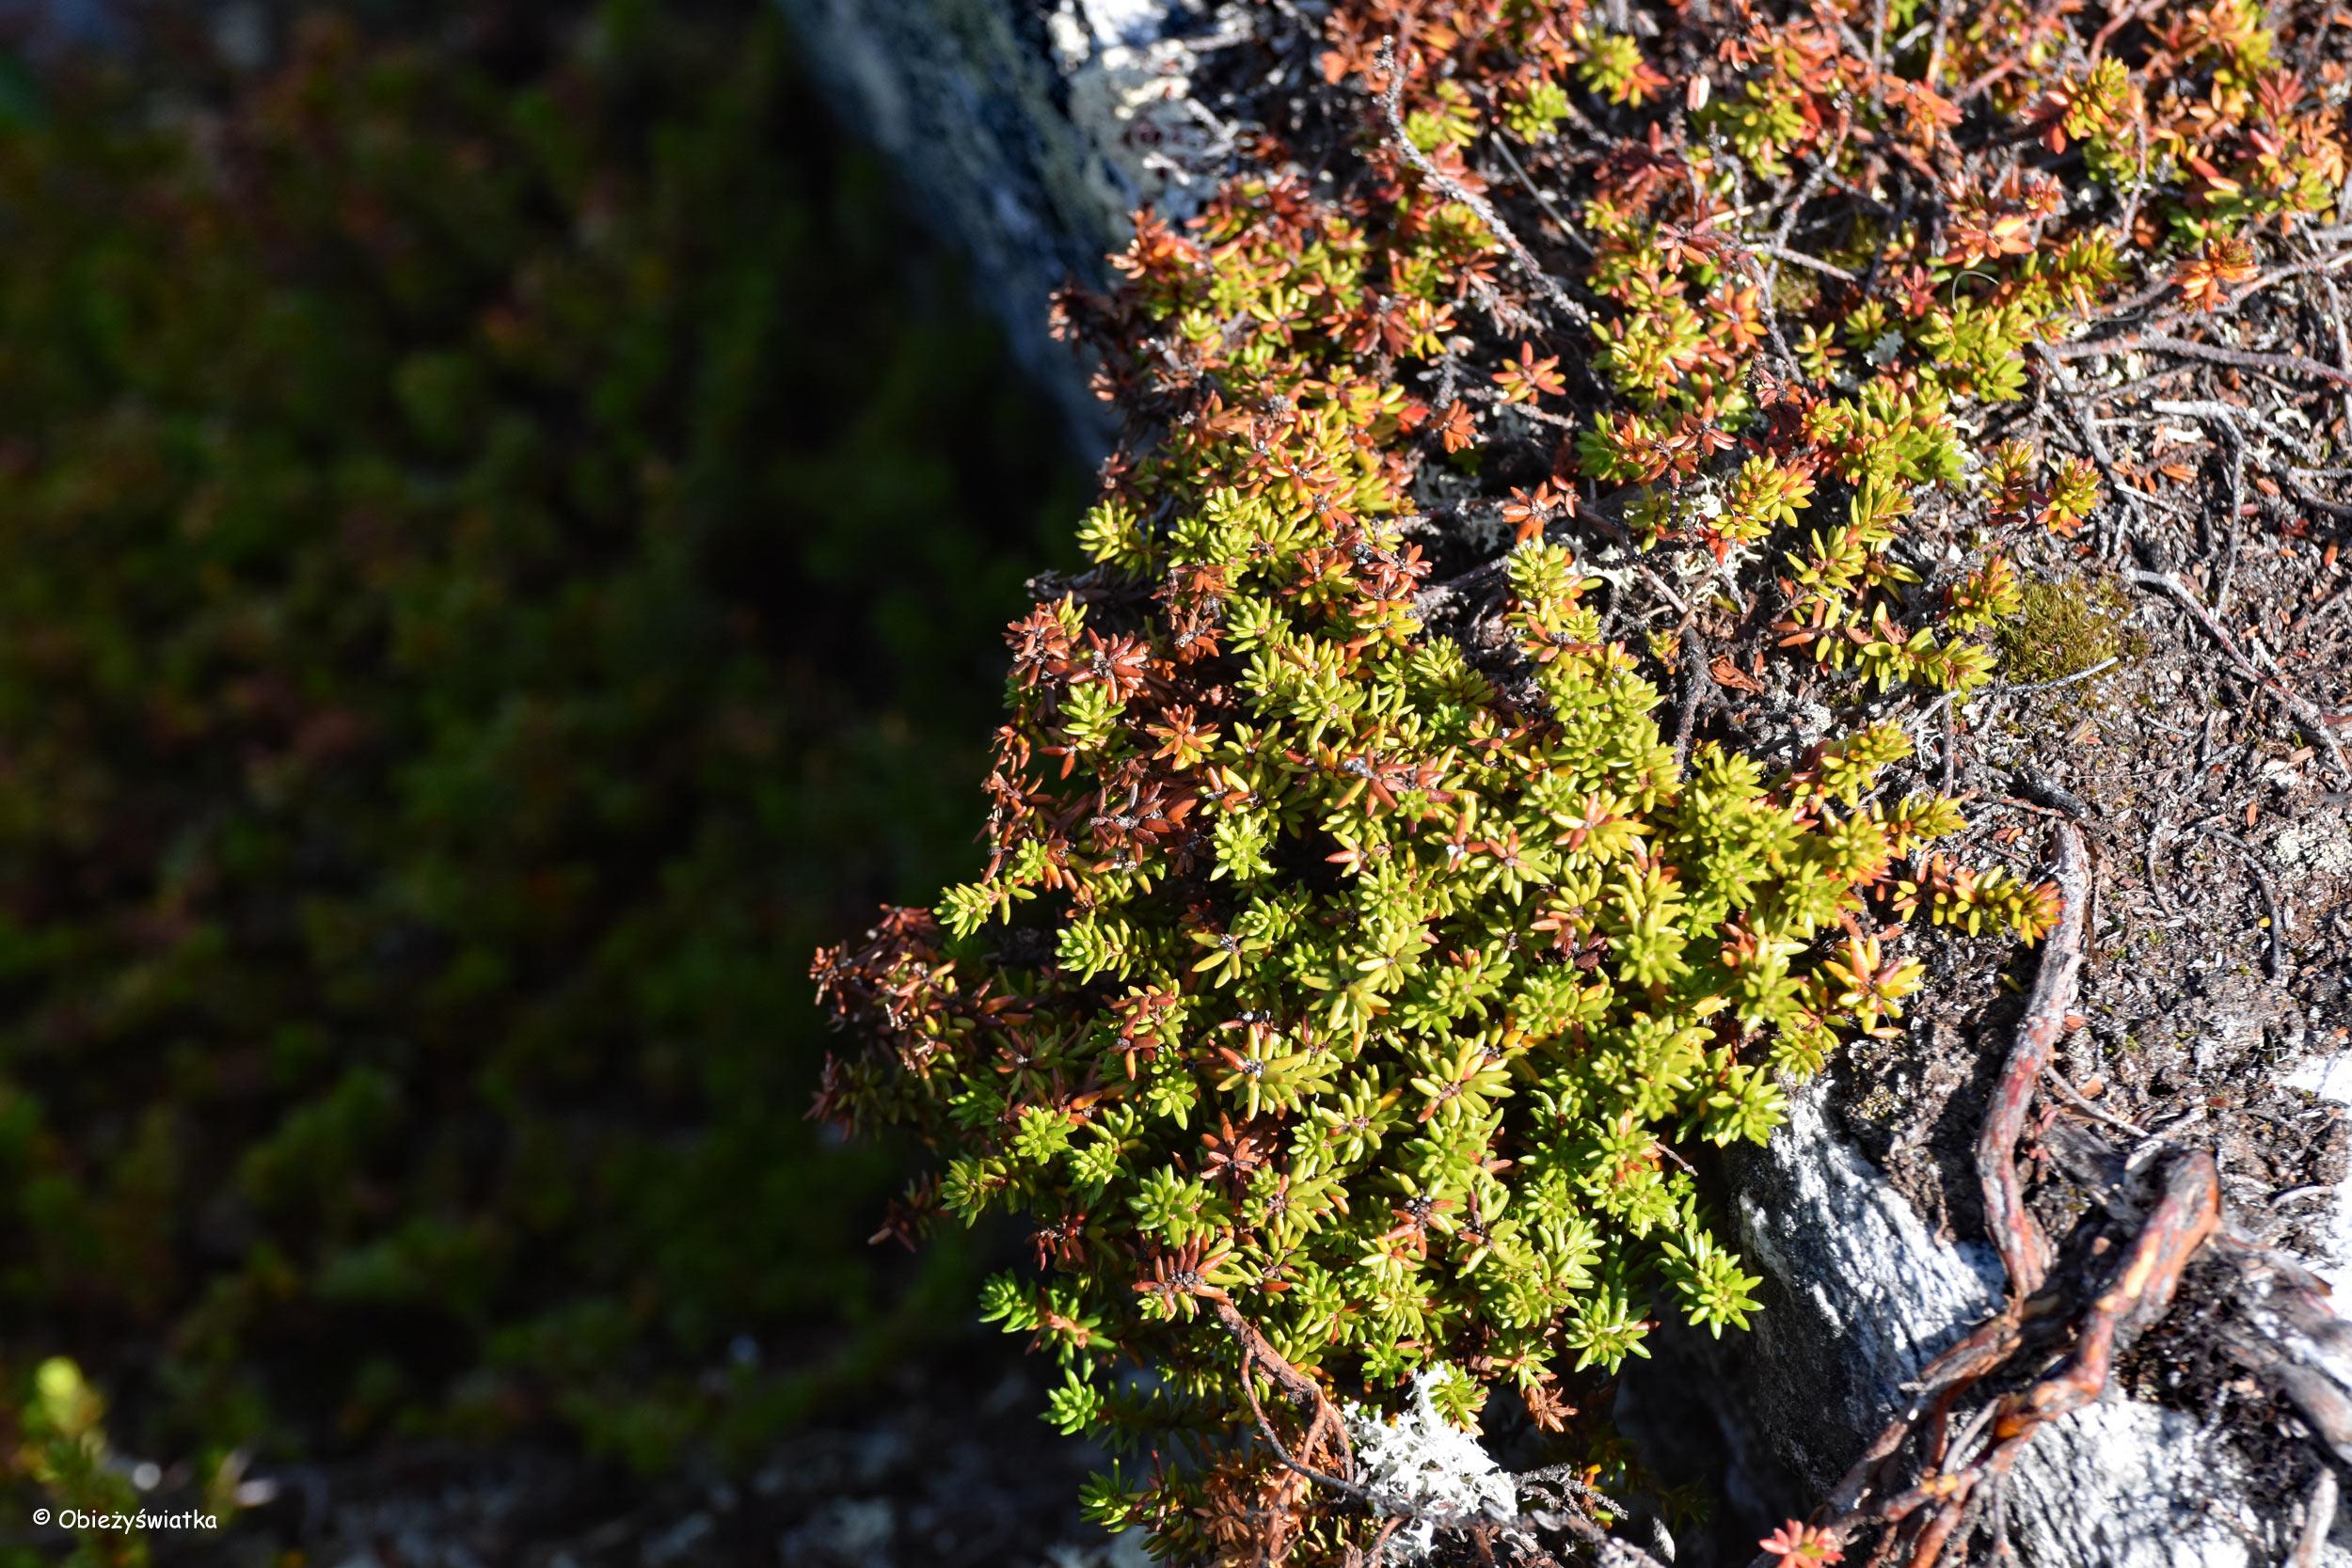 Miękkość mchu pod palcami - Gamle Strynefjellsvegen, Norwegia